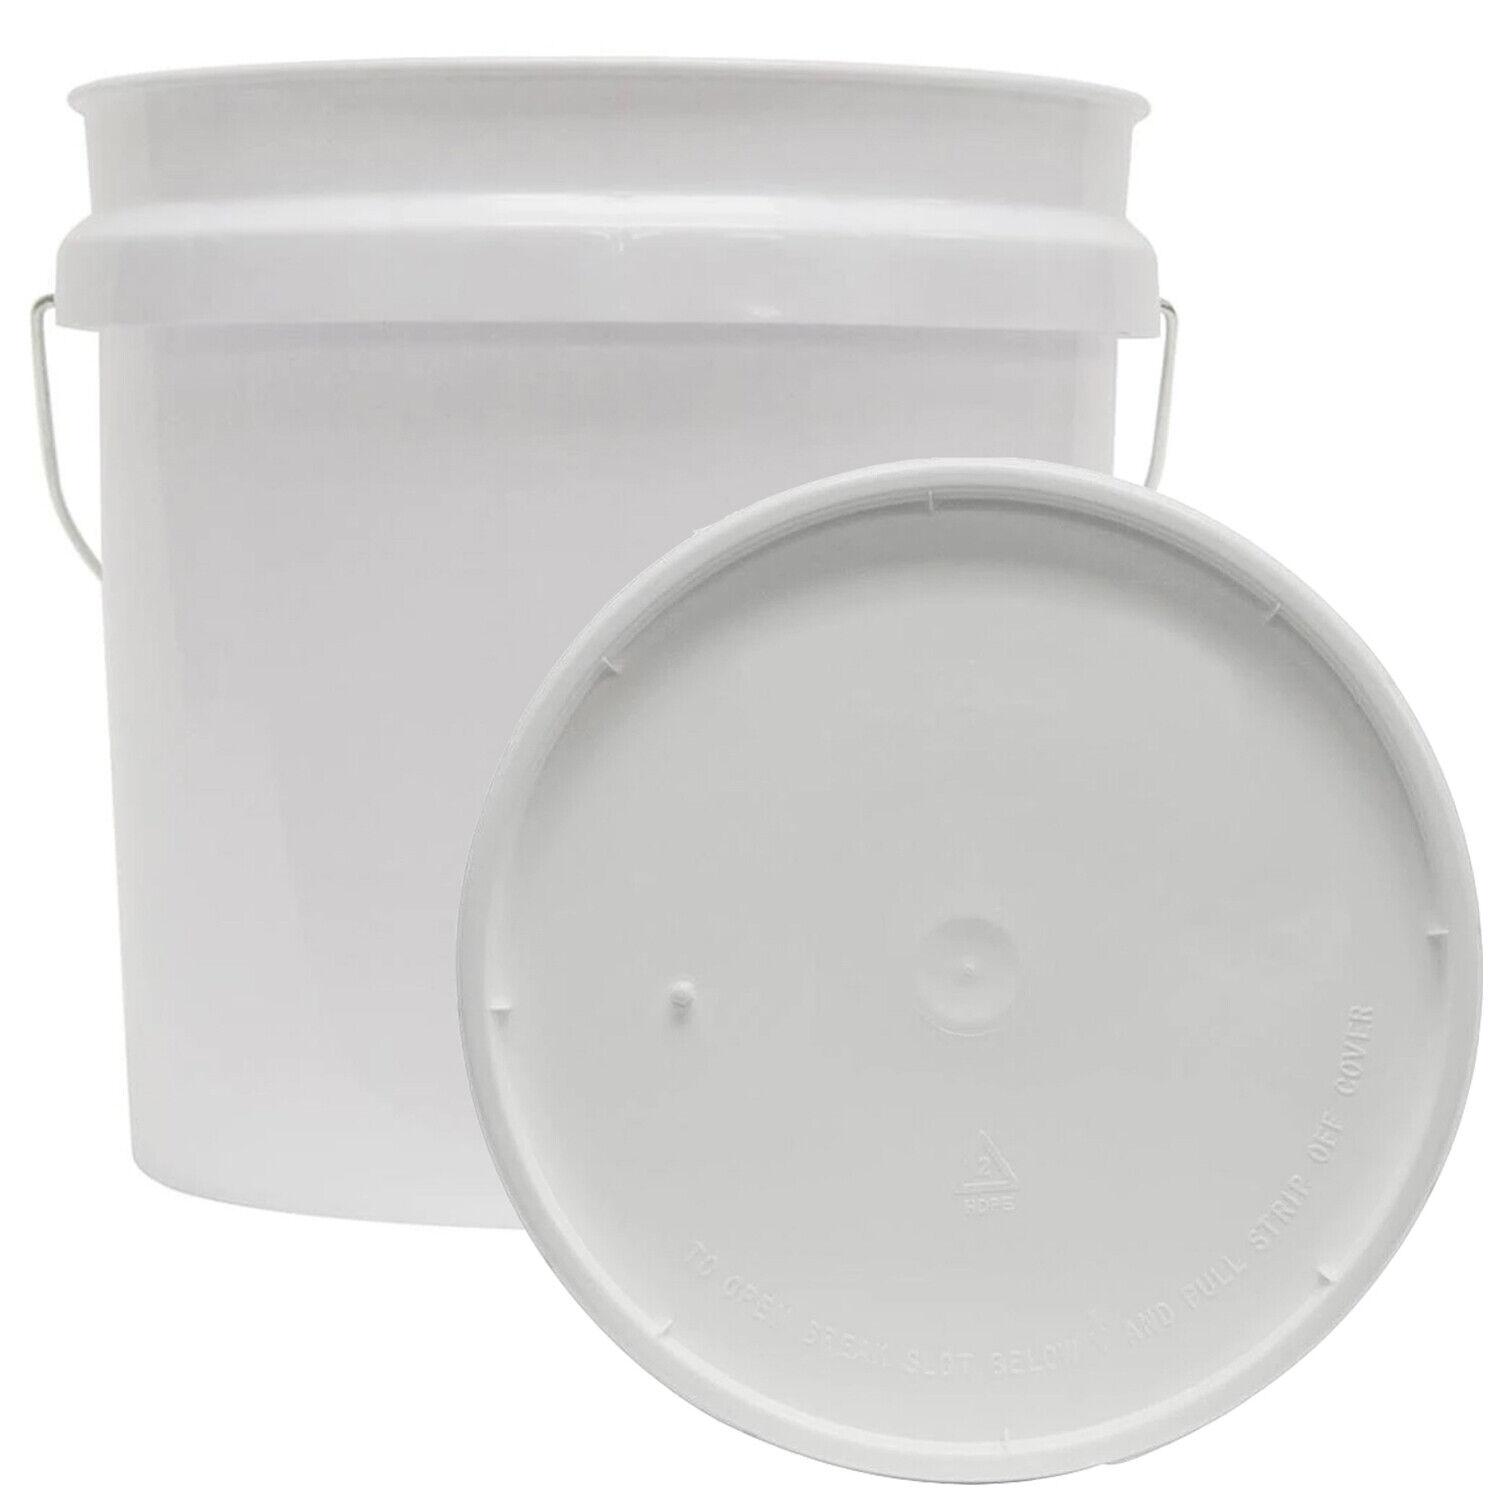 2 GALLON RESIDENTIAL BUCKET Food Grade BPA Free Plastic Stor